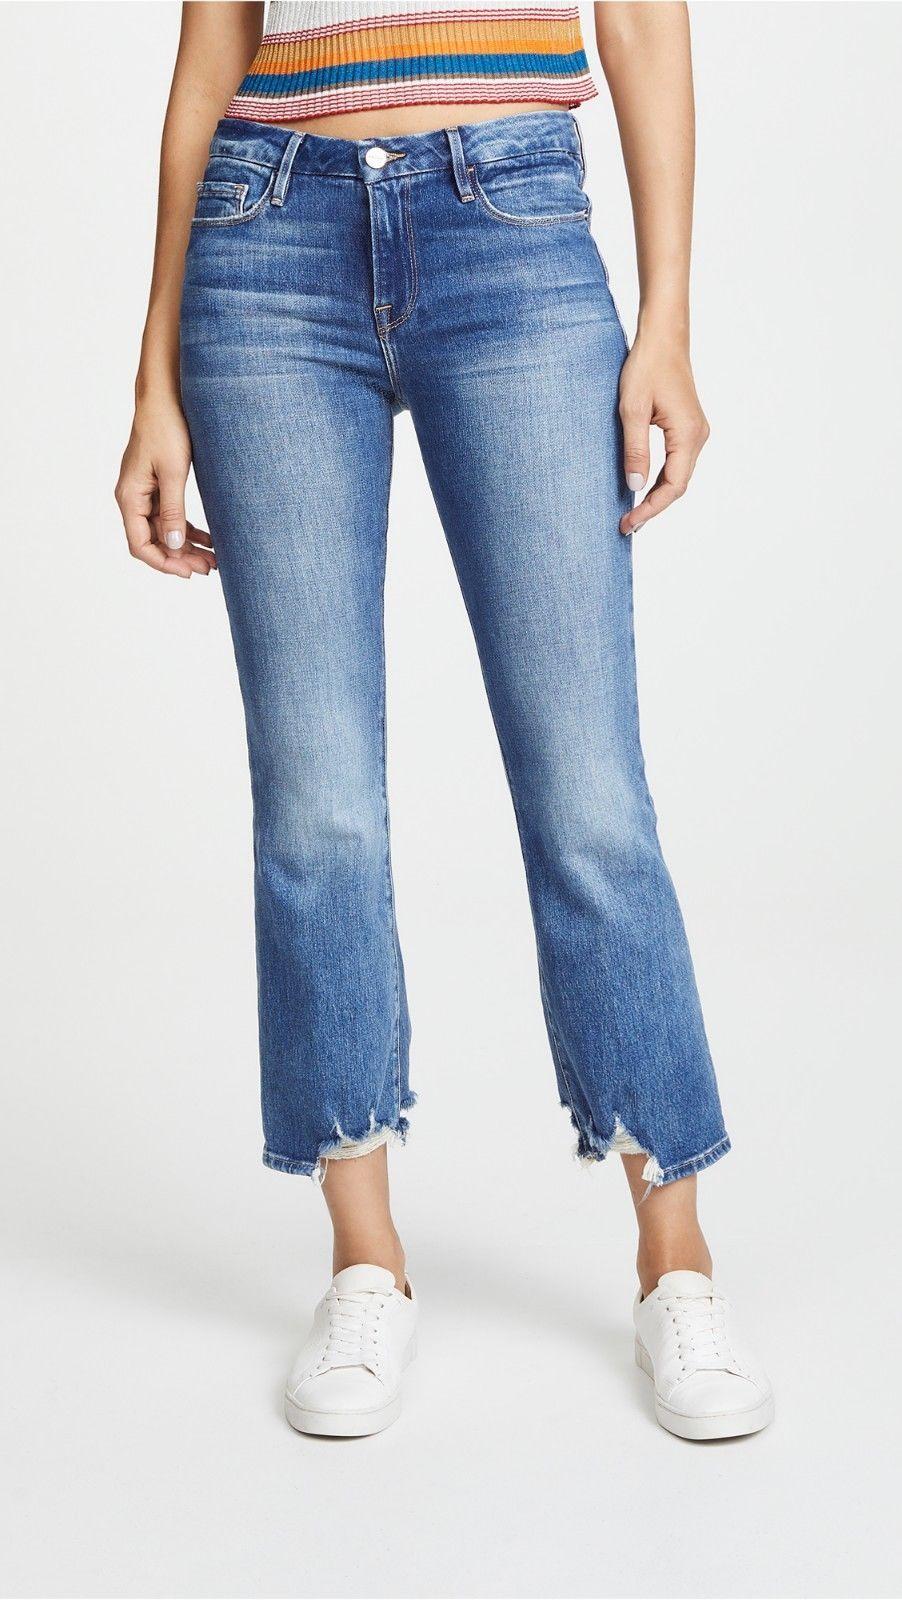 Crop Size Jeans 49 Denim Boot Le 24 New Frame Mini 99 Clapson xXXg41wf